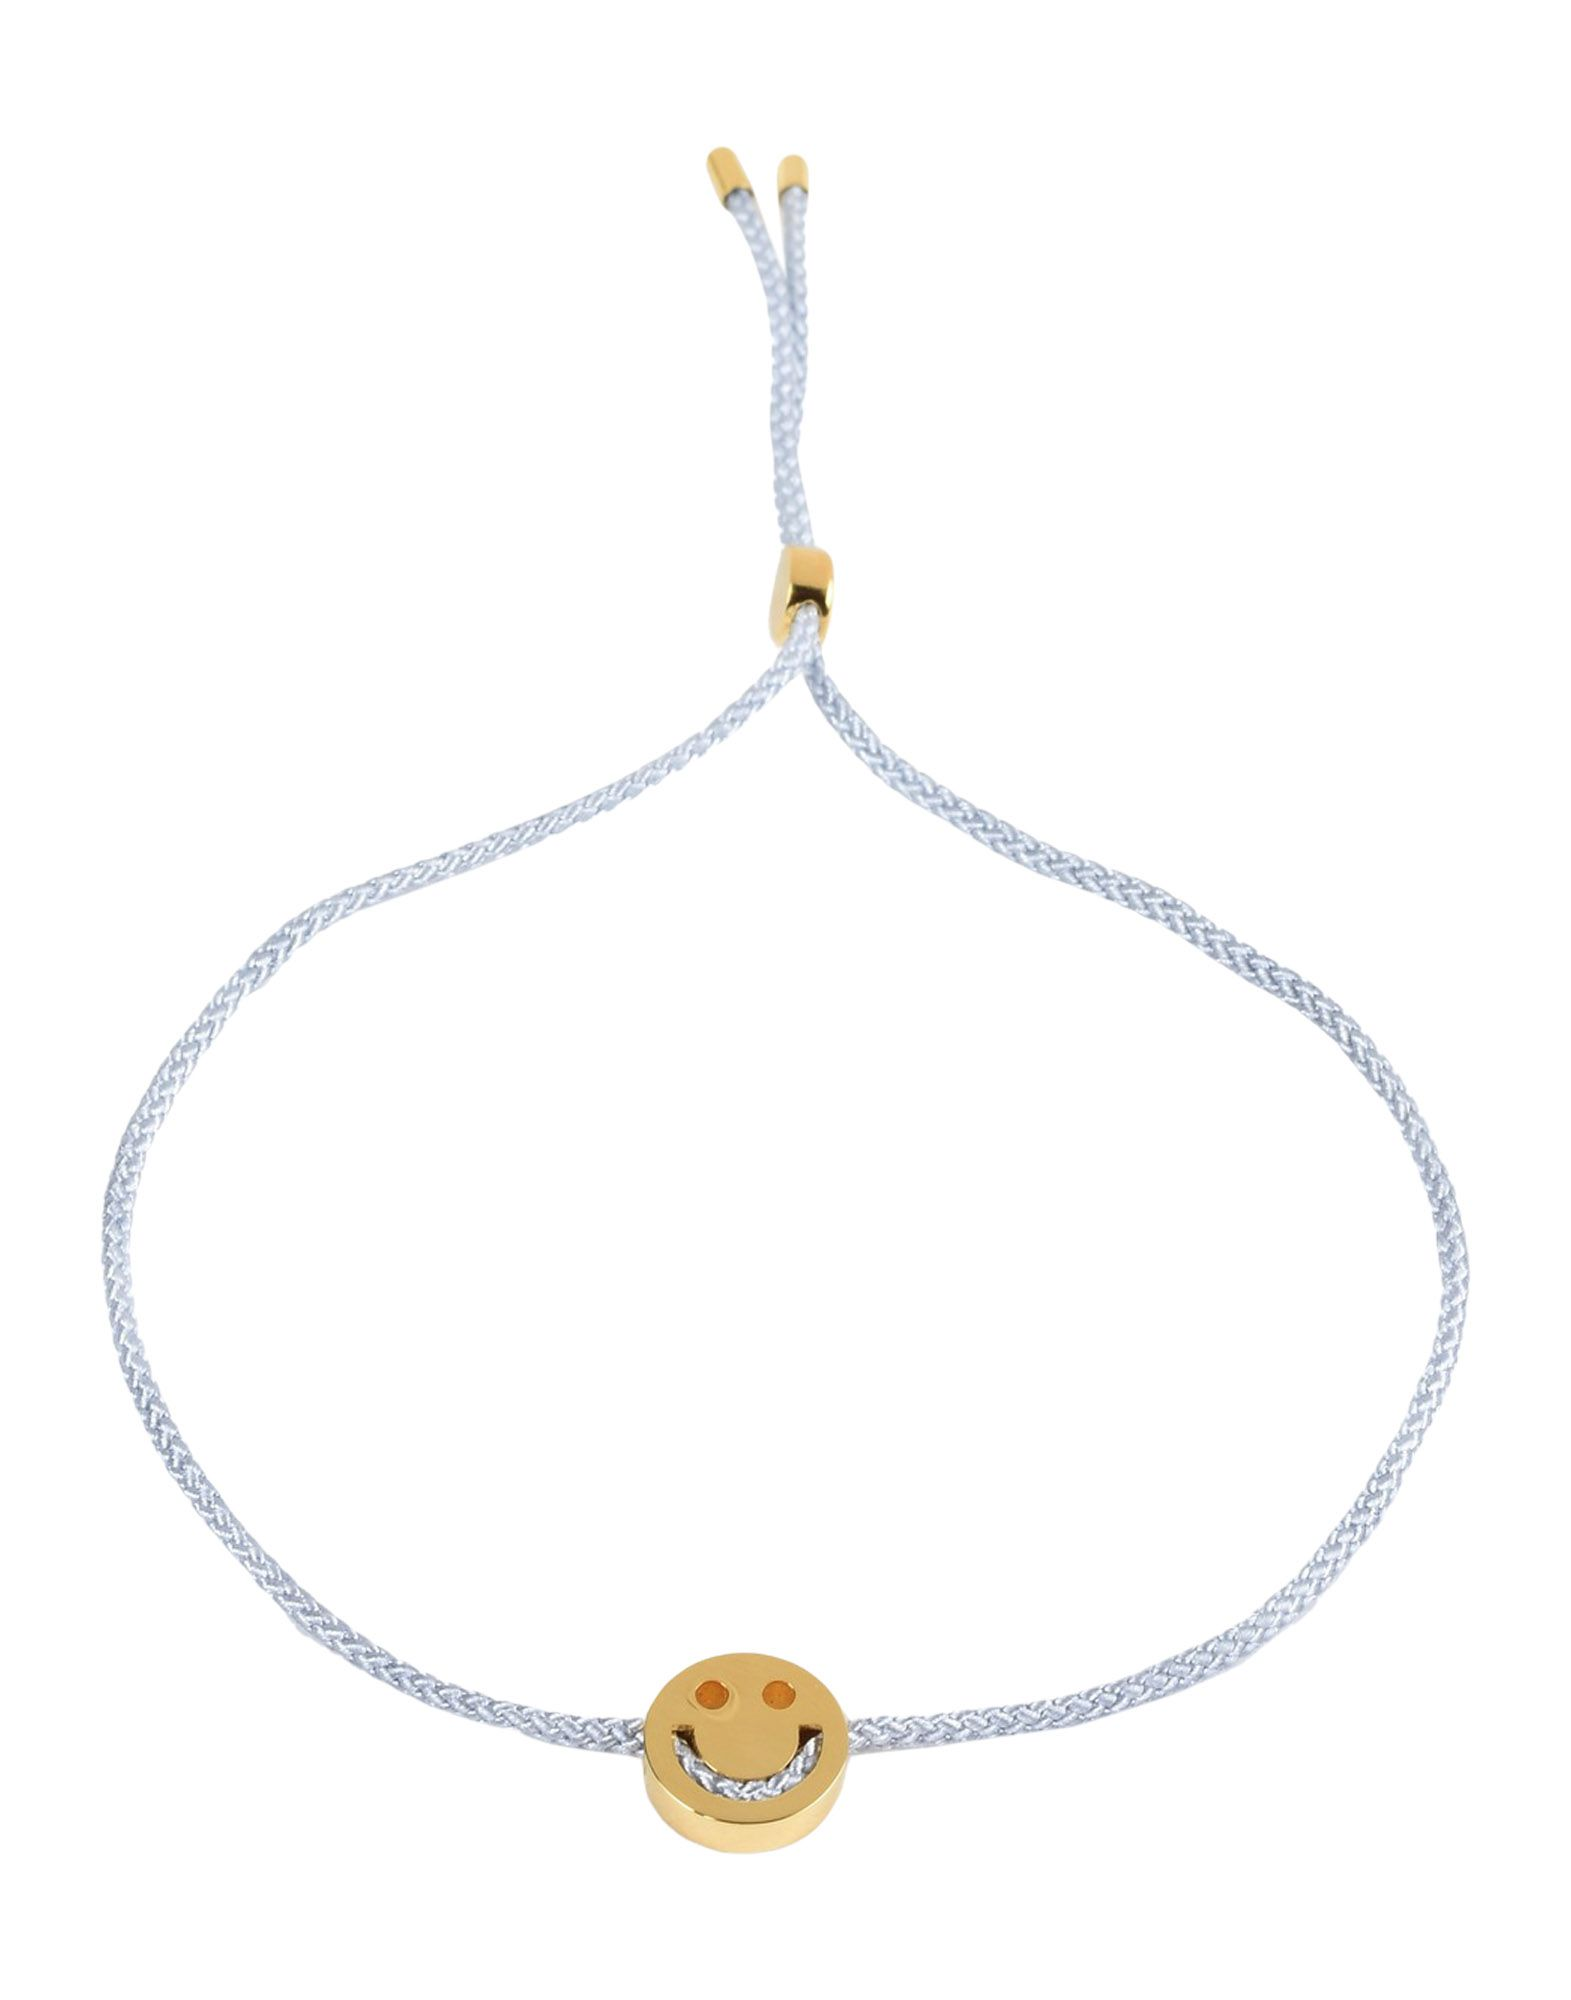 Bracciale Ruifier Friends Happy Bracelet_Light Grey - Uomo - Acquista online su